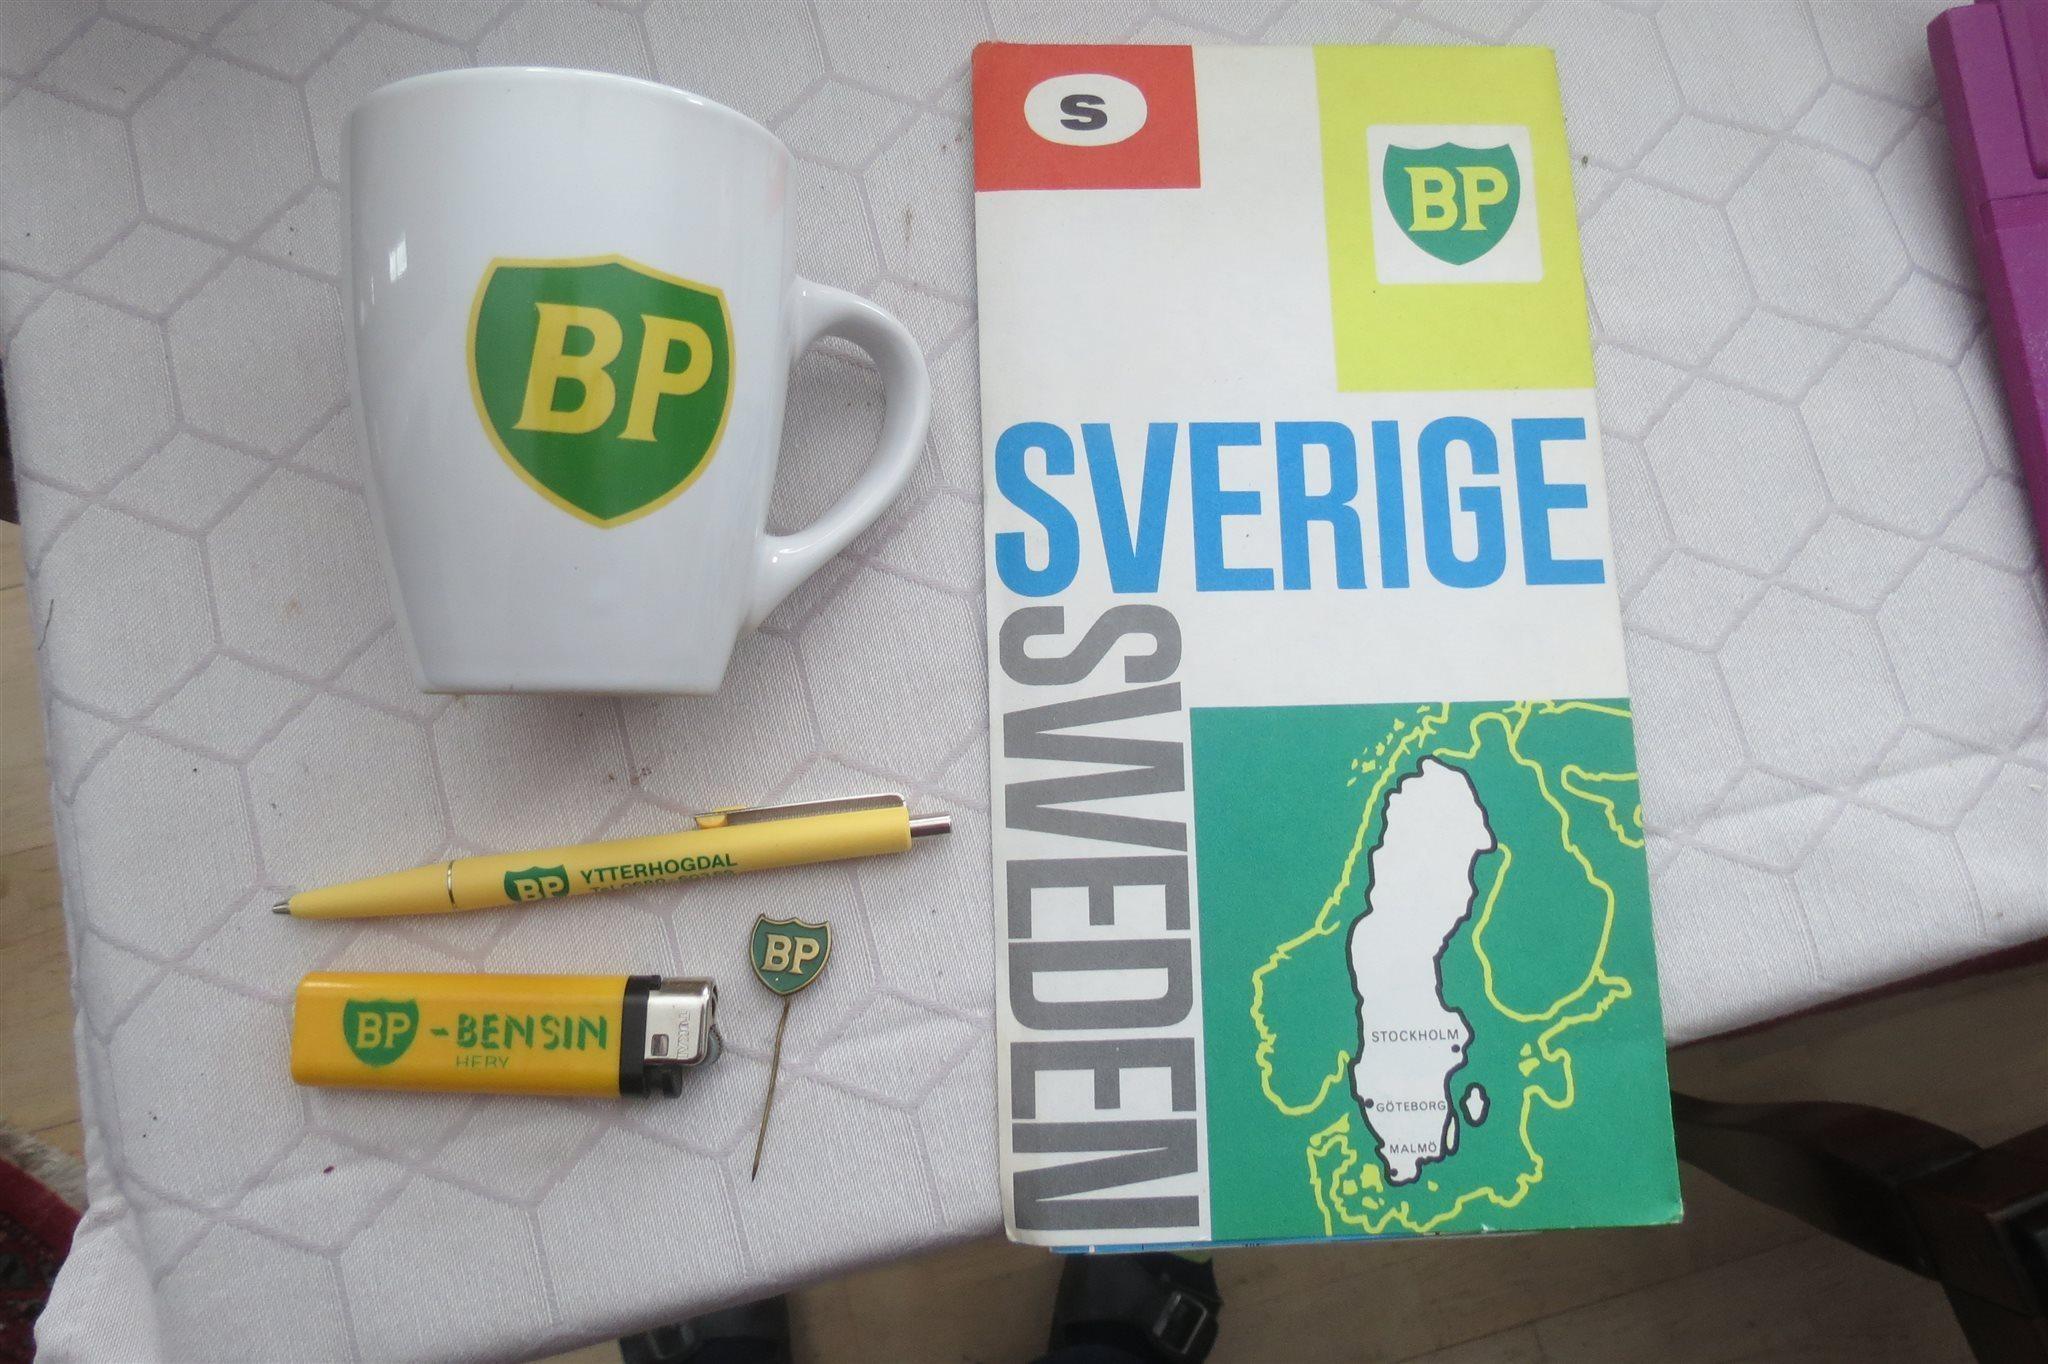 bensin karta BP bensin reklam penna Ytterhogdal, tändare kar.. (317323868) ᐈ  bensin karta